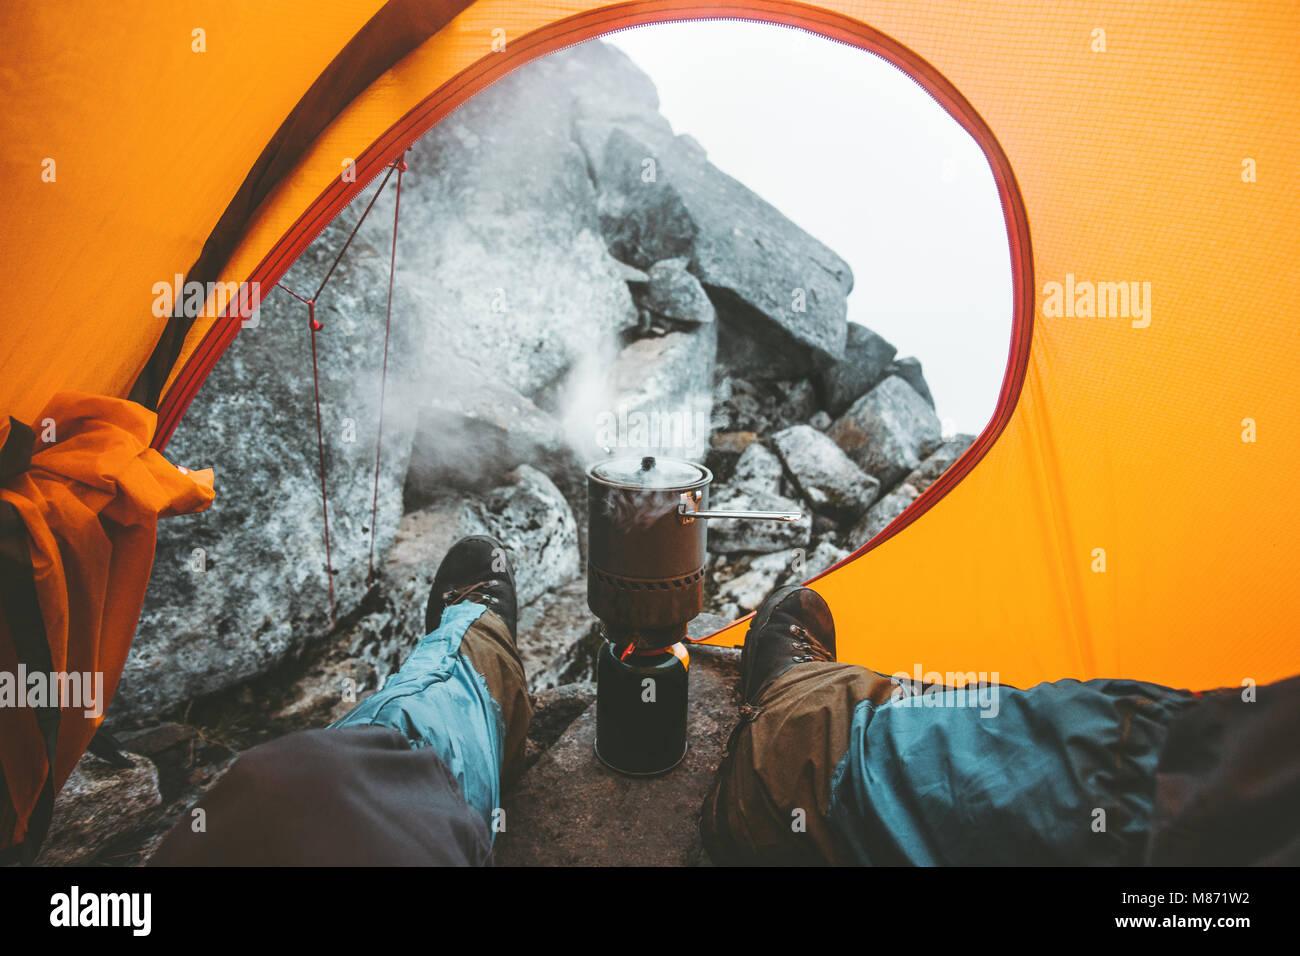 Mann reisender Kochen im Topf auf Herd Brenner entspannen in camping Zelt Reisen Lifestyle Konzept Urlaub Outdoor Stockbild